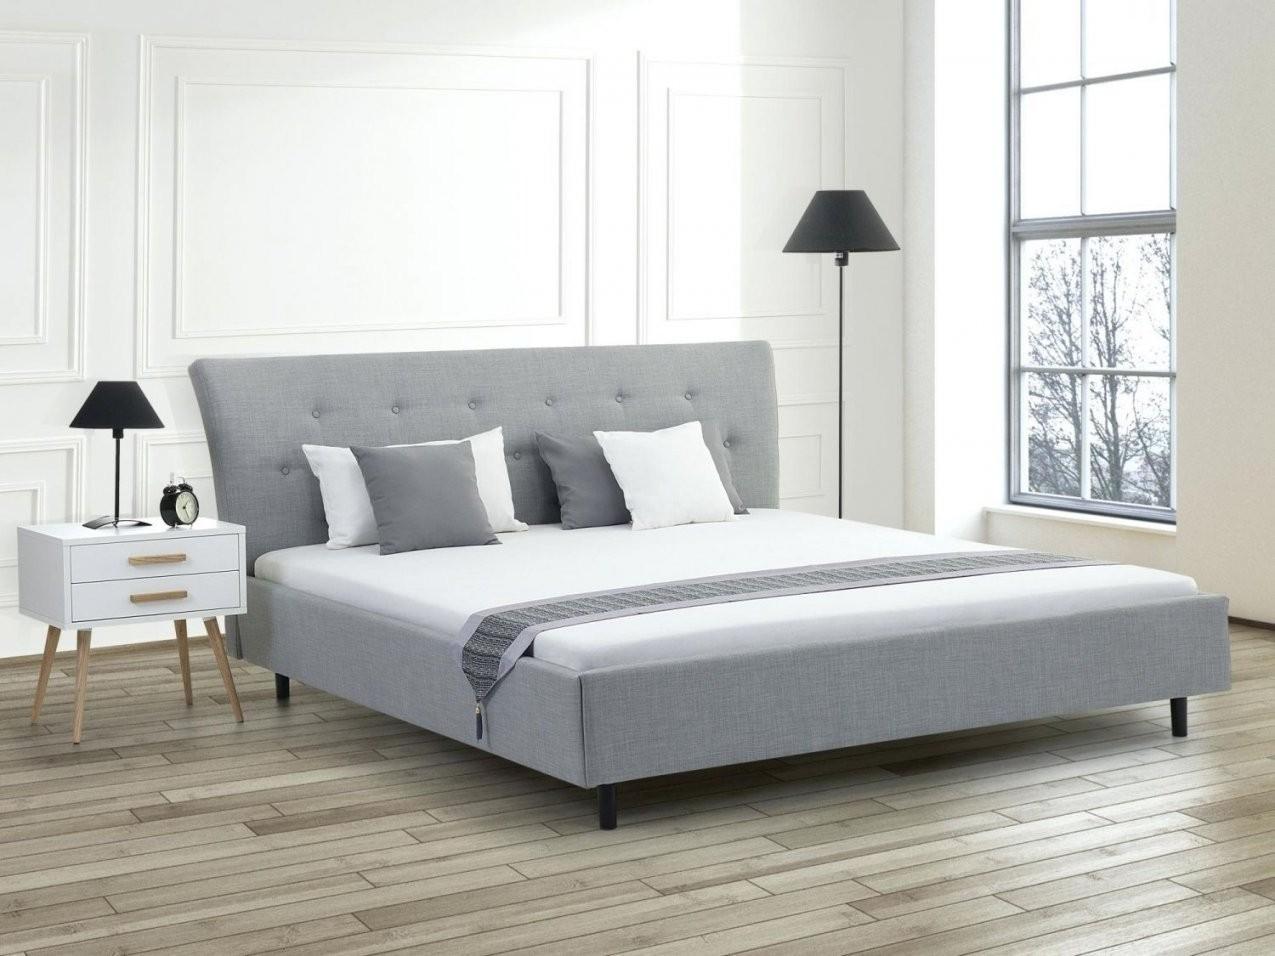 Trend Bett 160X200 Mit Lattenrost Und Matratze Bett 160×200 Mit von Bett 160X200 Mit Lattenrost Und Matratze Photo